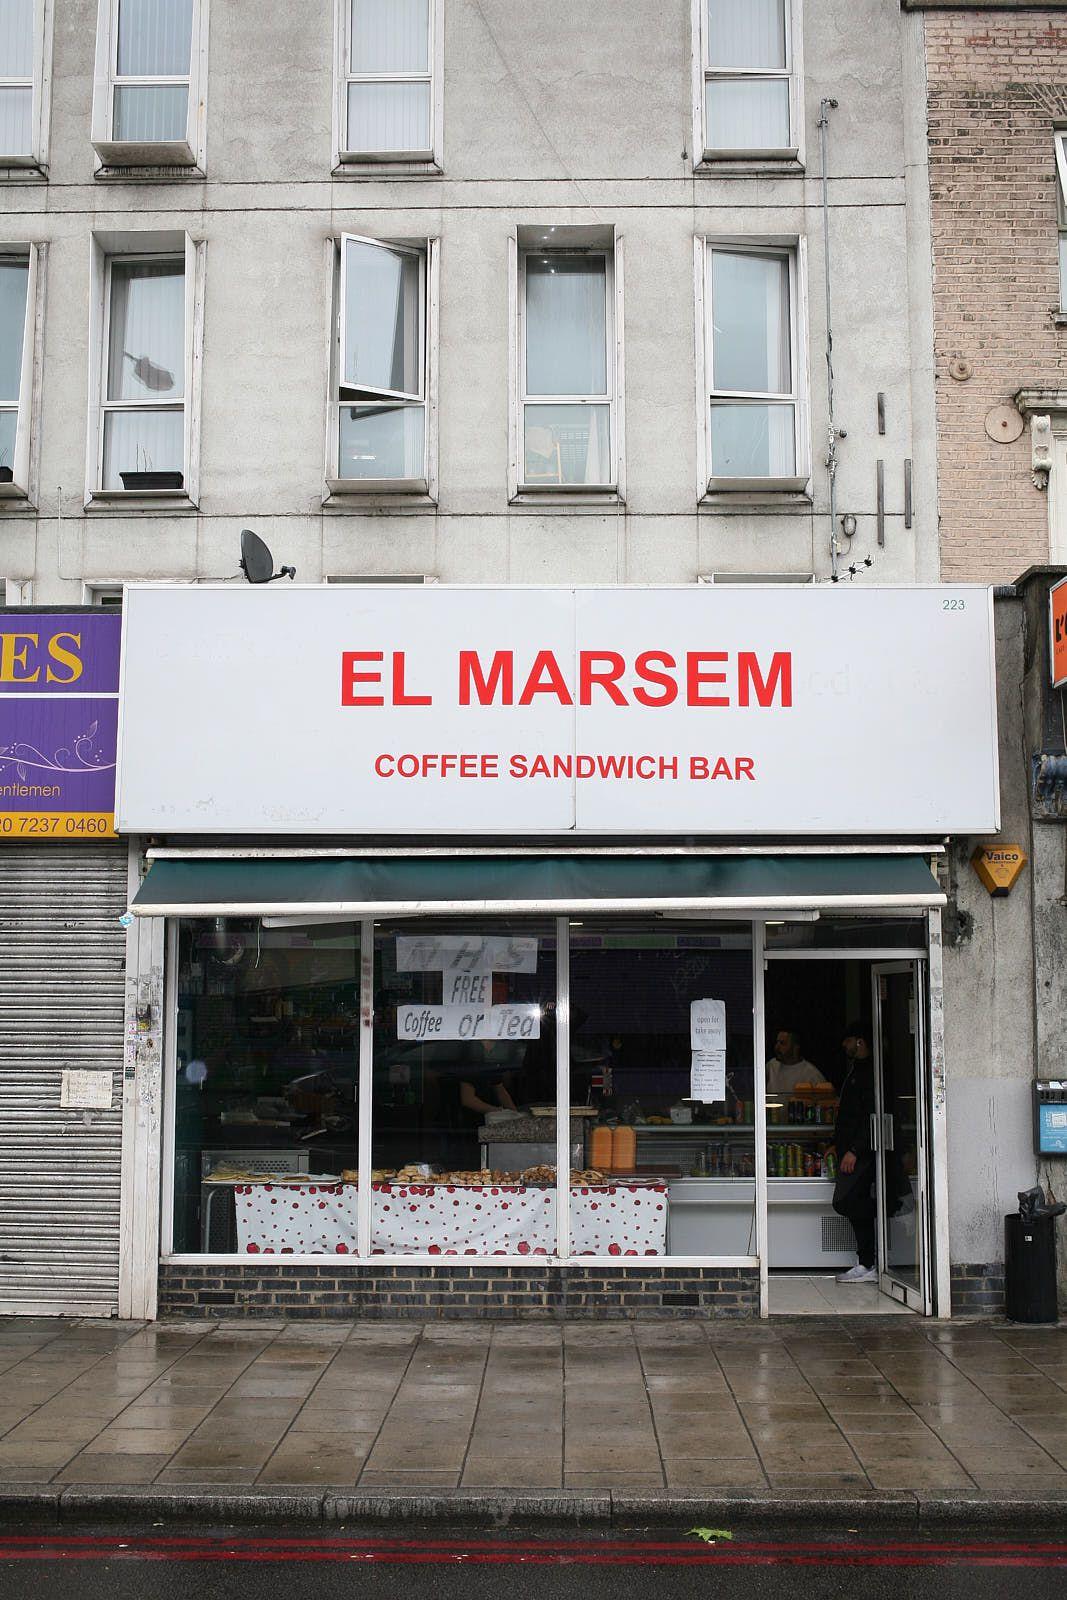 El Marsem, Algerian bakery on Old Kent Road, London